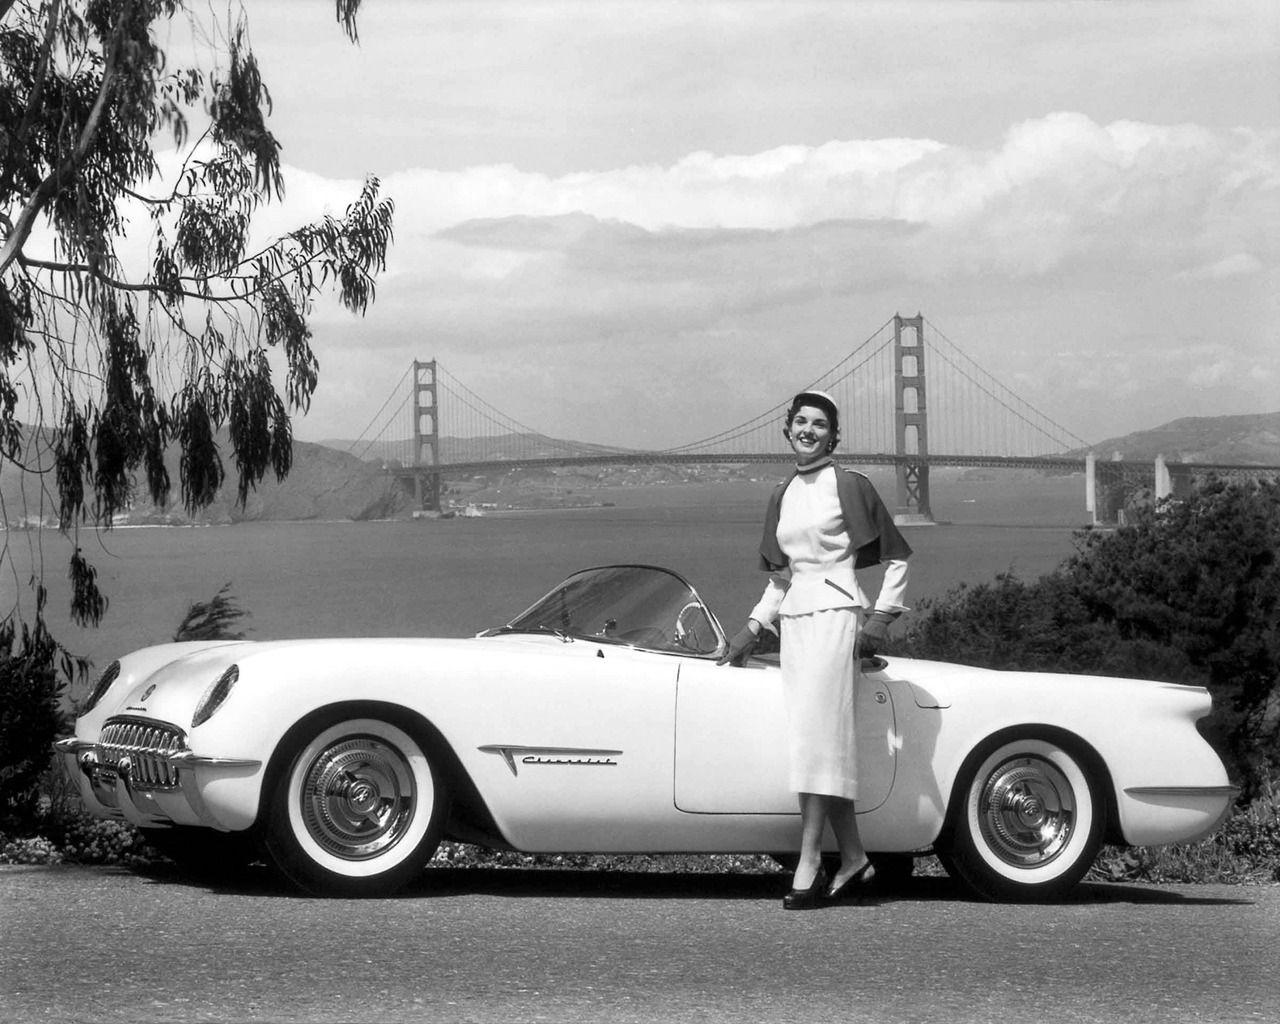 Advertising Photo Of The 1954 Chevrolet Corvette Taken On El Camino Del Mar Near